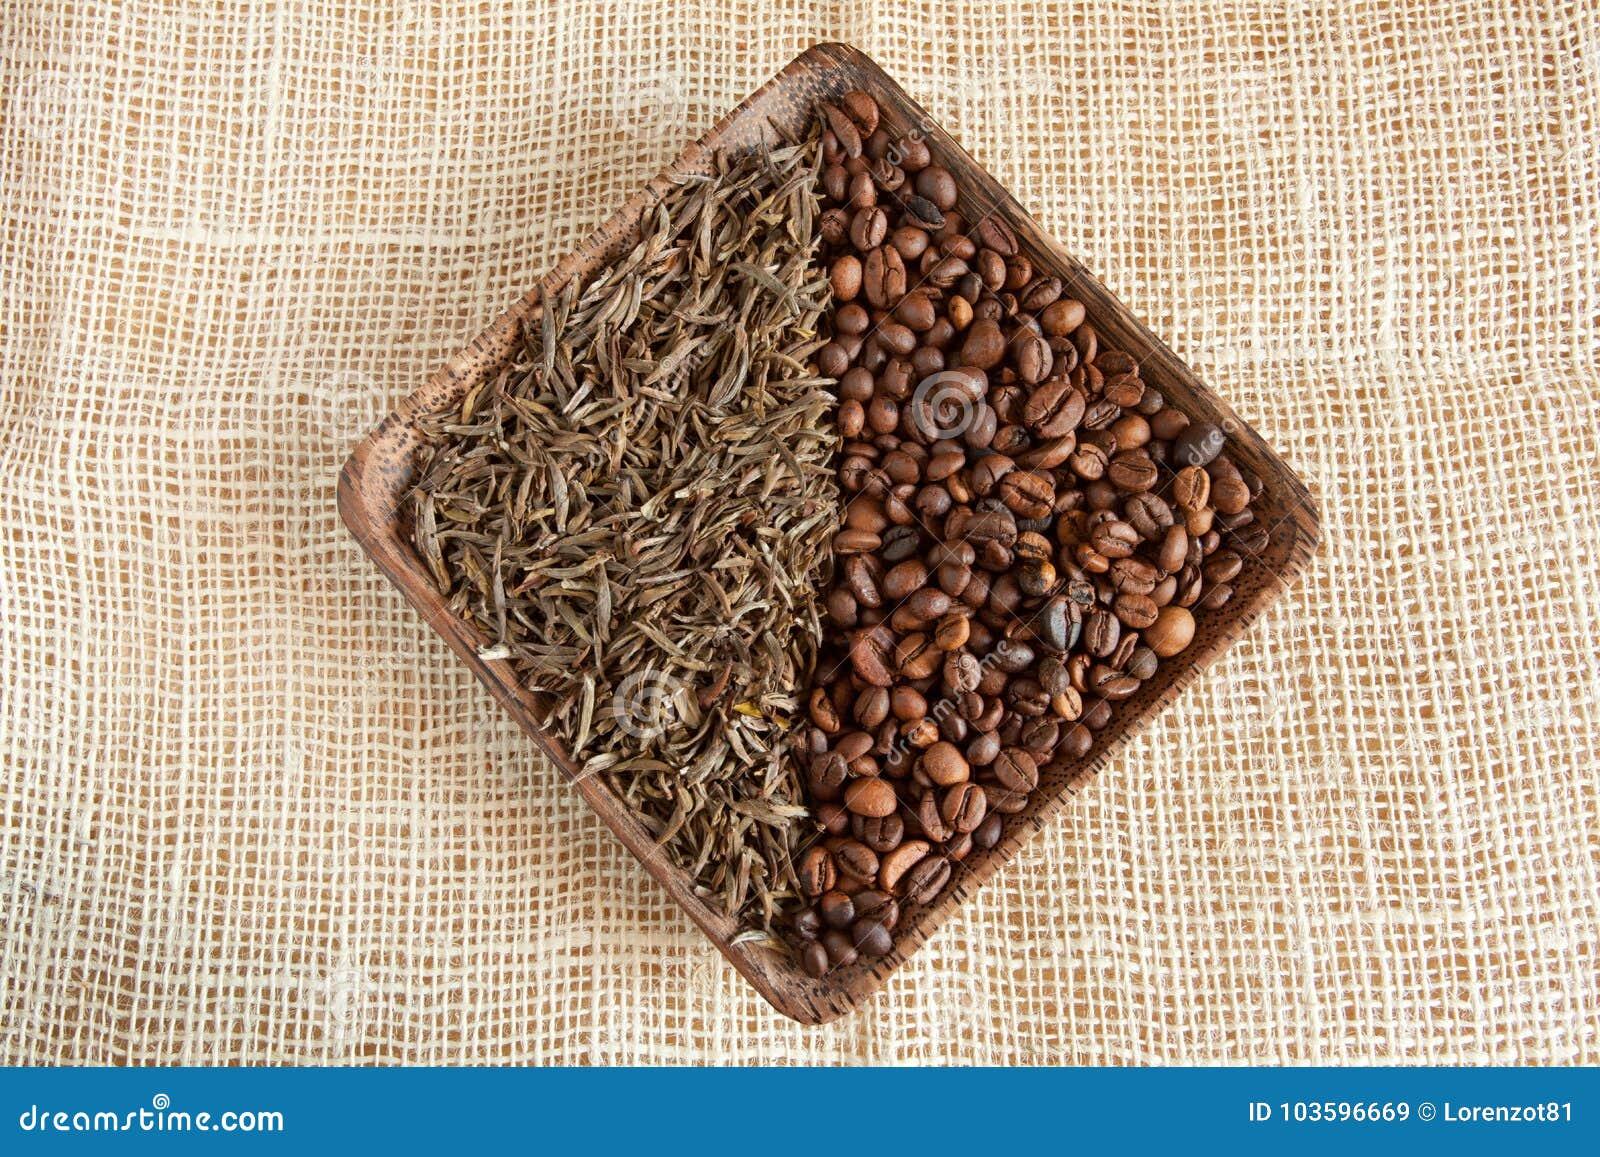 recipe: caffeine in tea bag vs coffee [39]